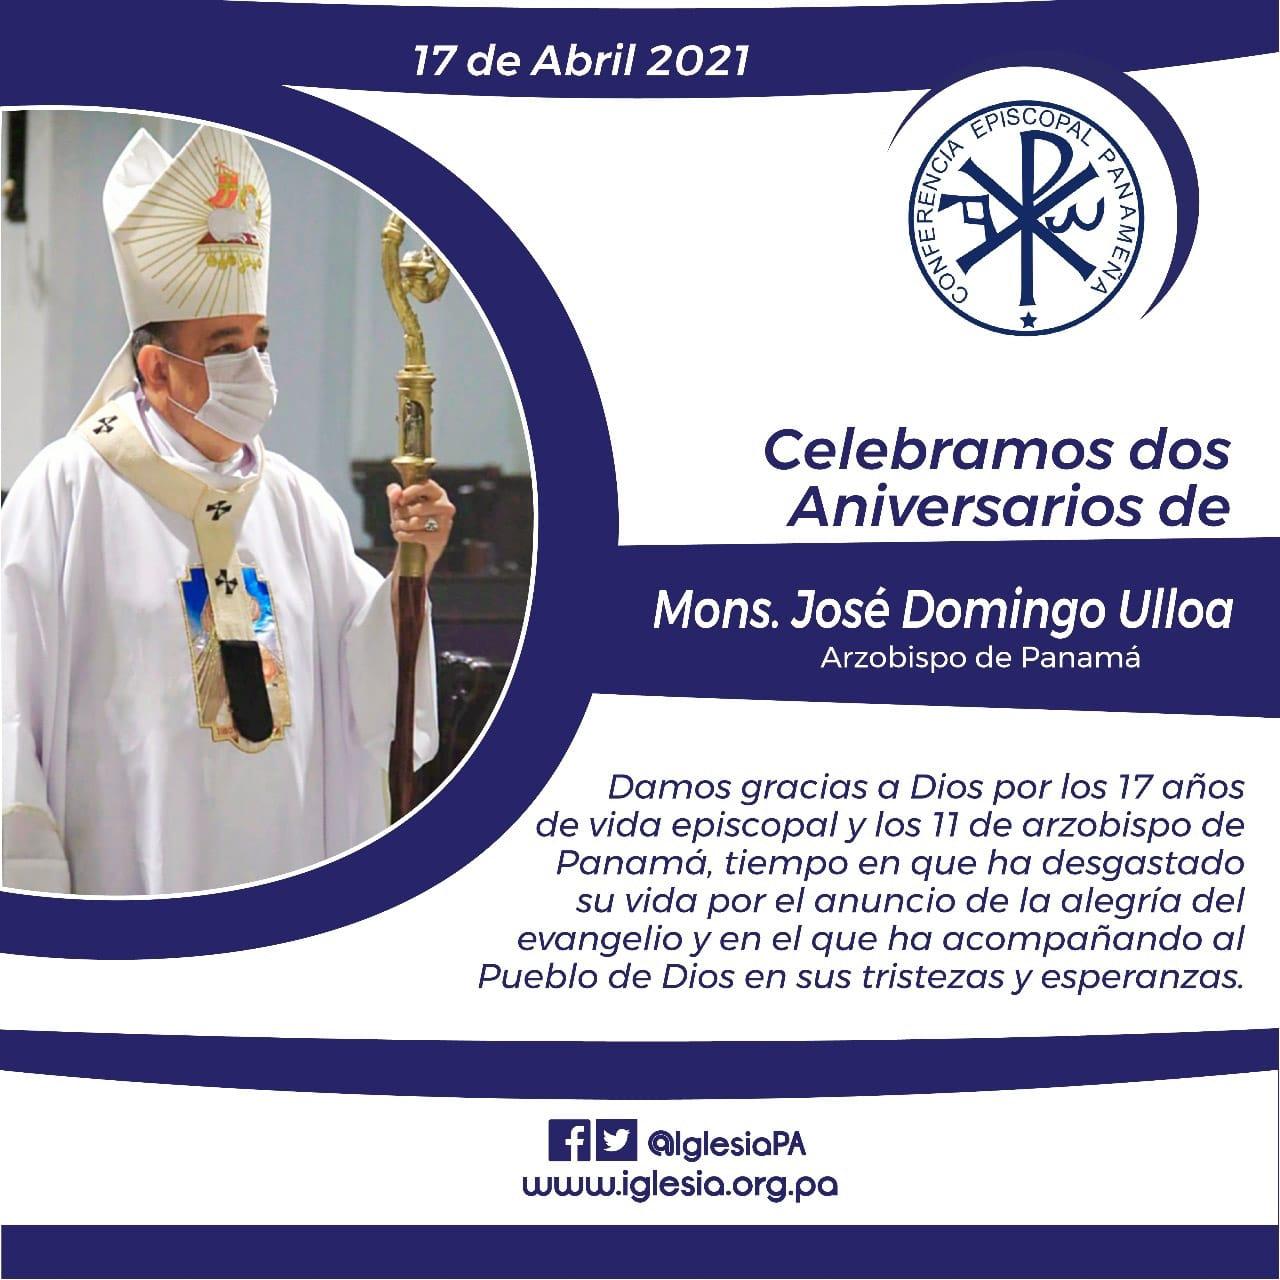 Feliz aniversario a Monseñor José Domingo Ulloa